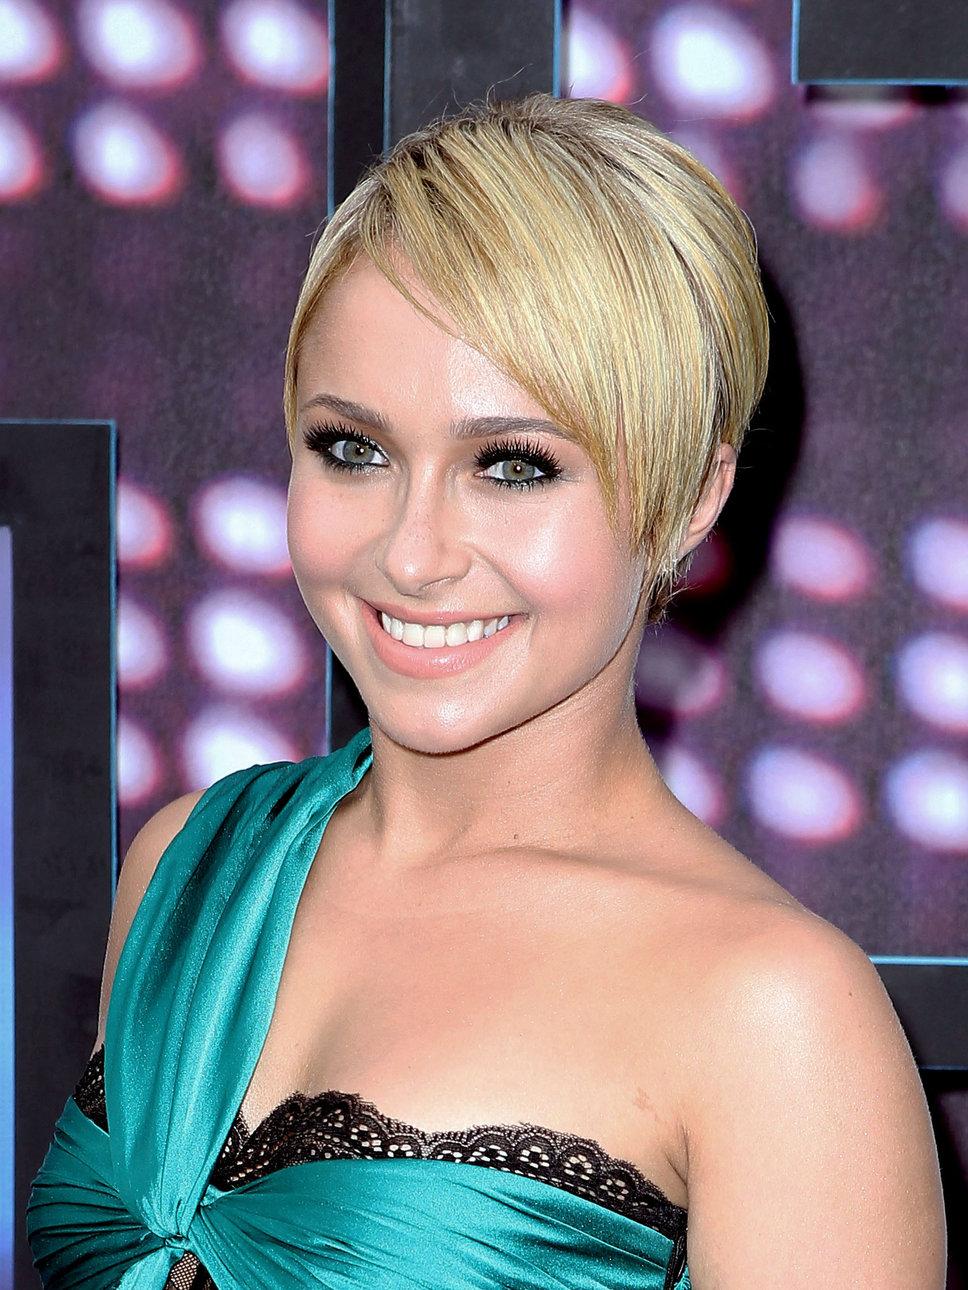 Hayden Panettiere Blonde Pixie Hairstyle Sheclick